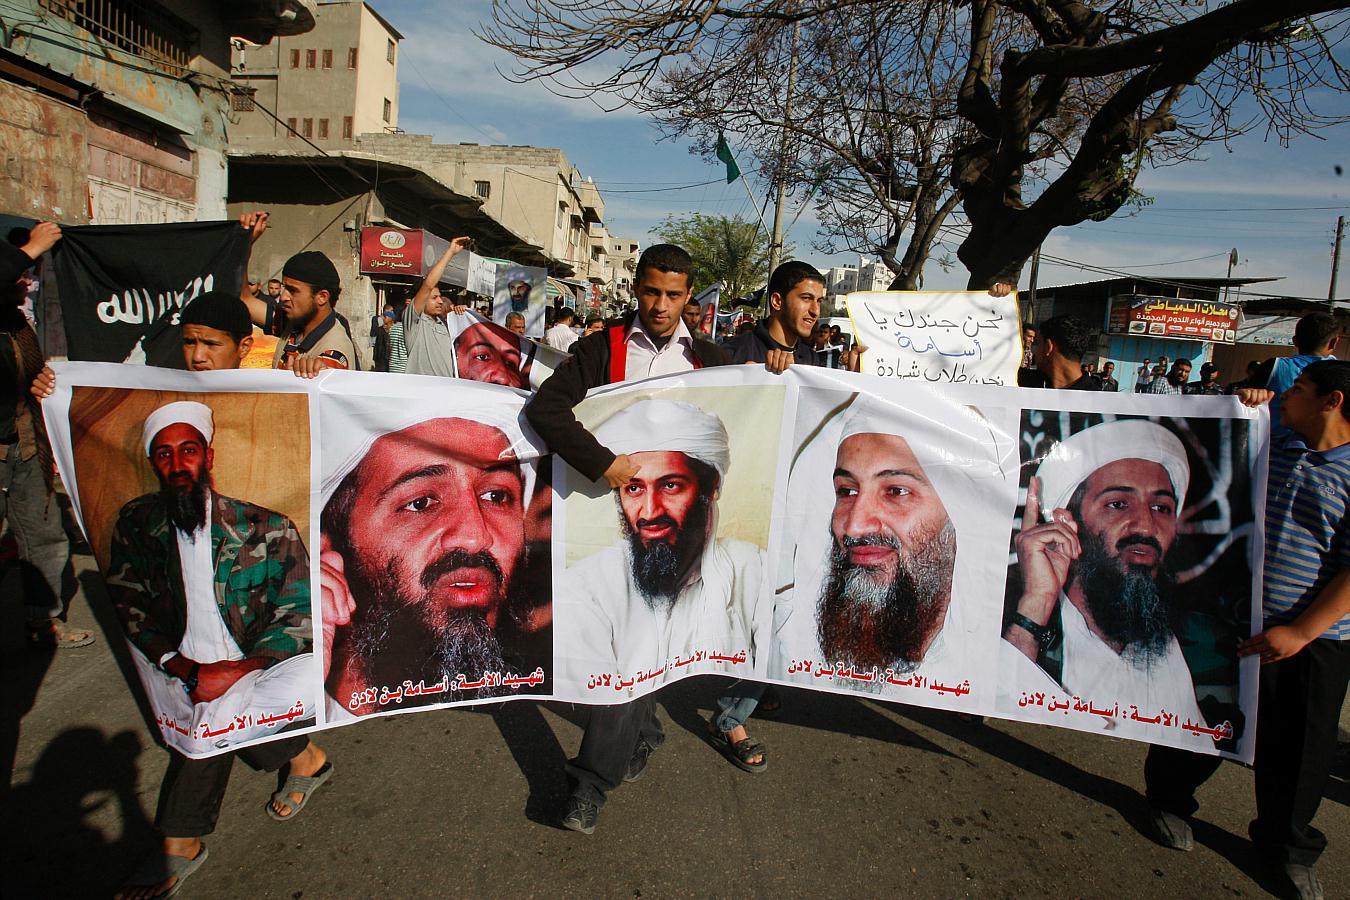 Osama Bin Laden Kill Protest Photos 2